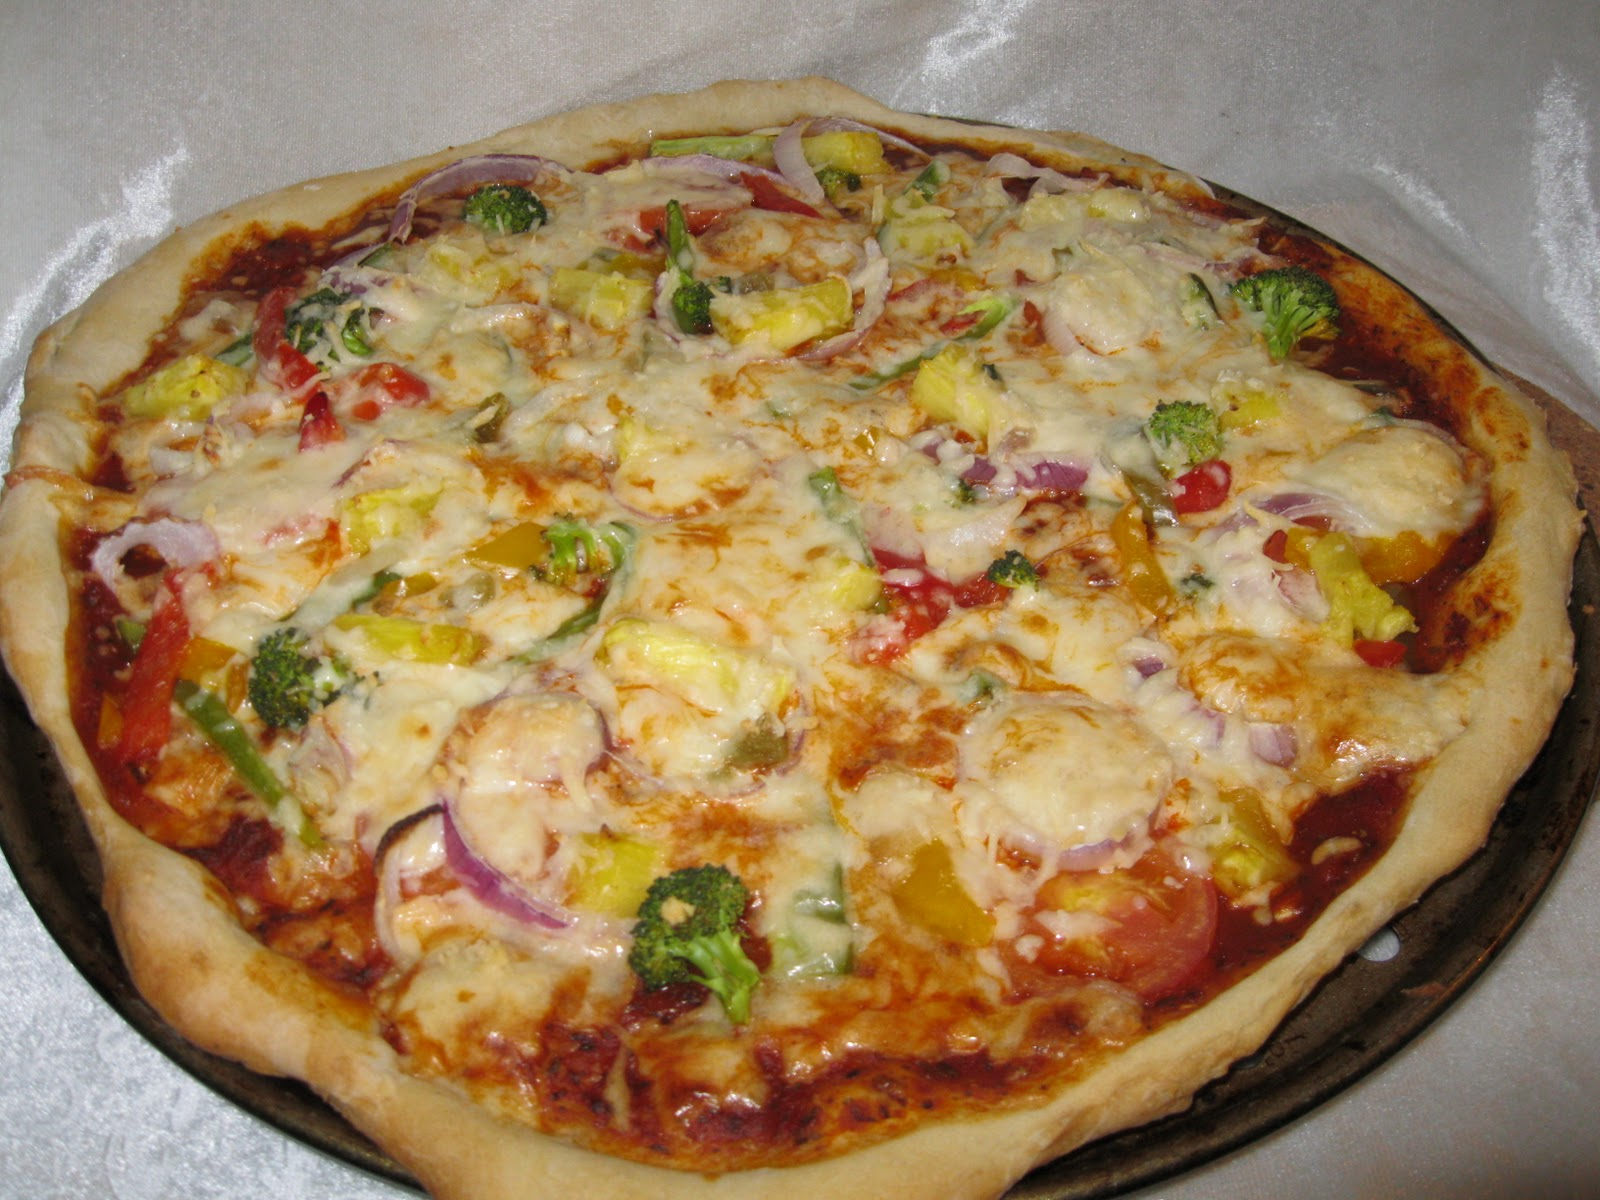 Vegan pizza homemade